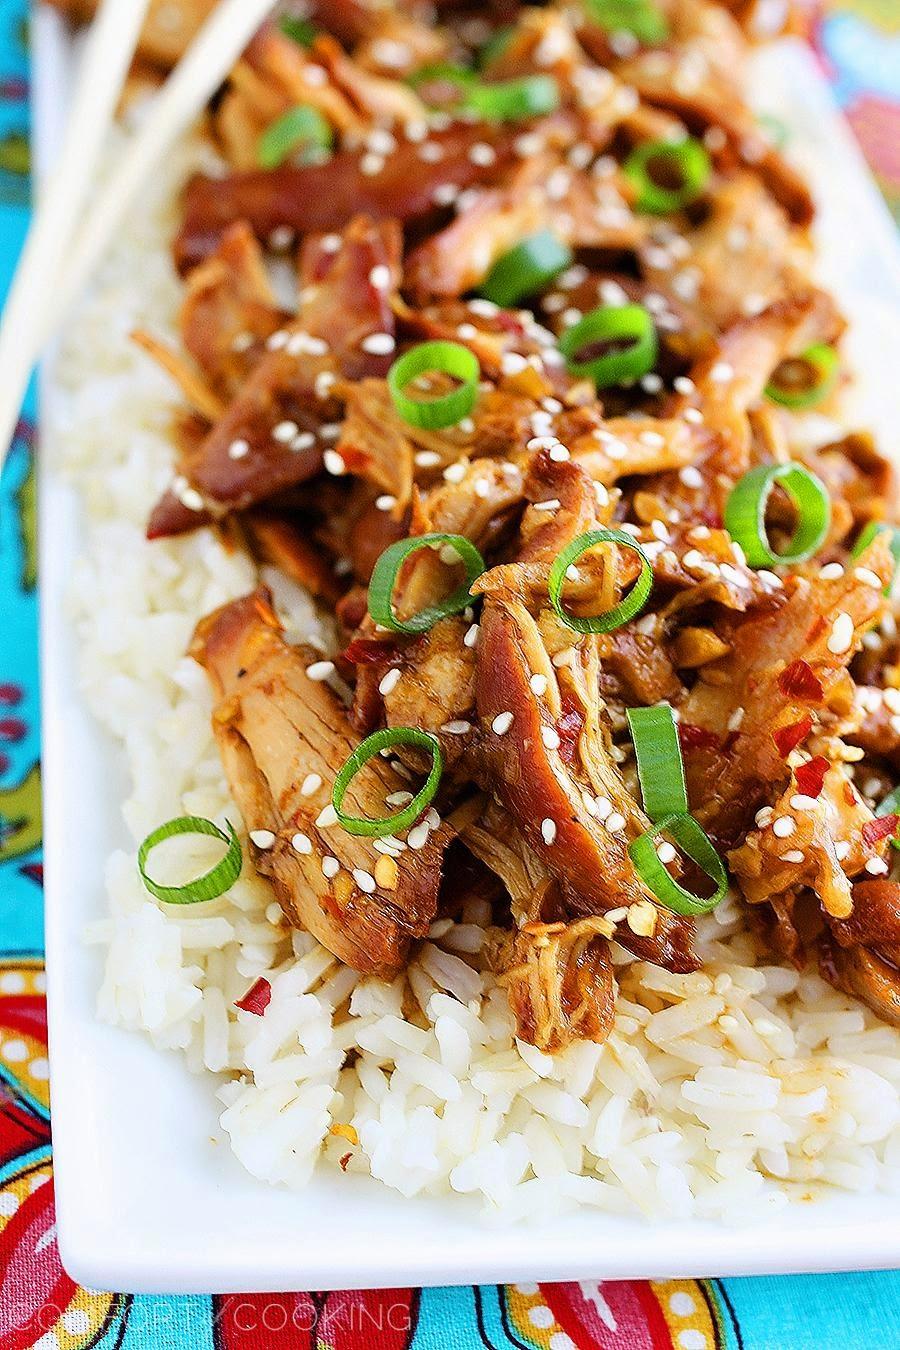 http://www.thecomfortofcooking.com/2012/08/crock-pot-honey-sesame-chicken.html